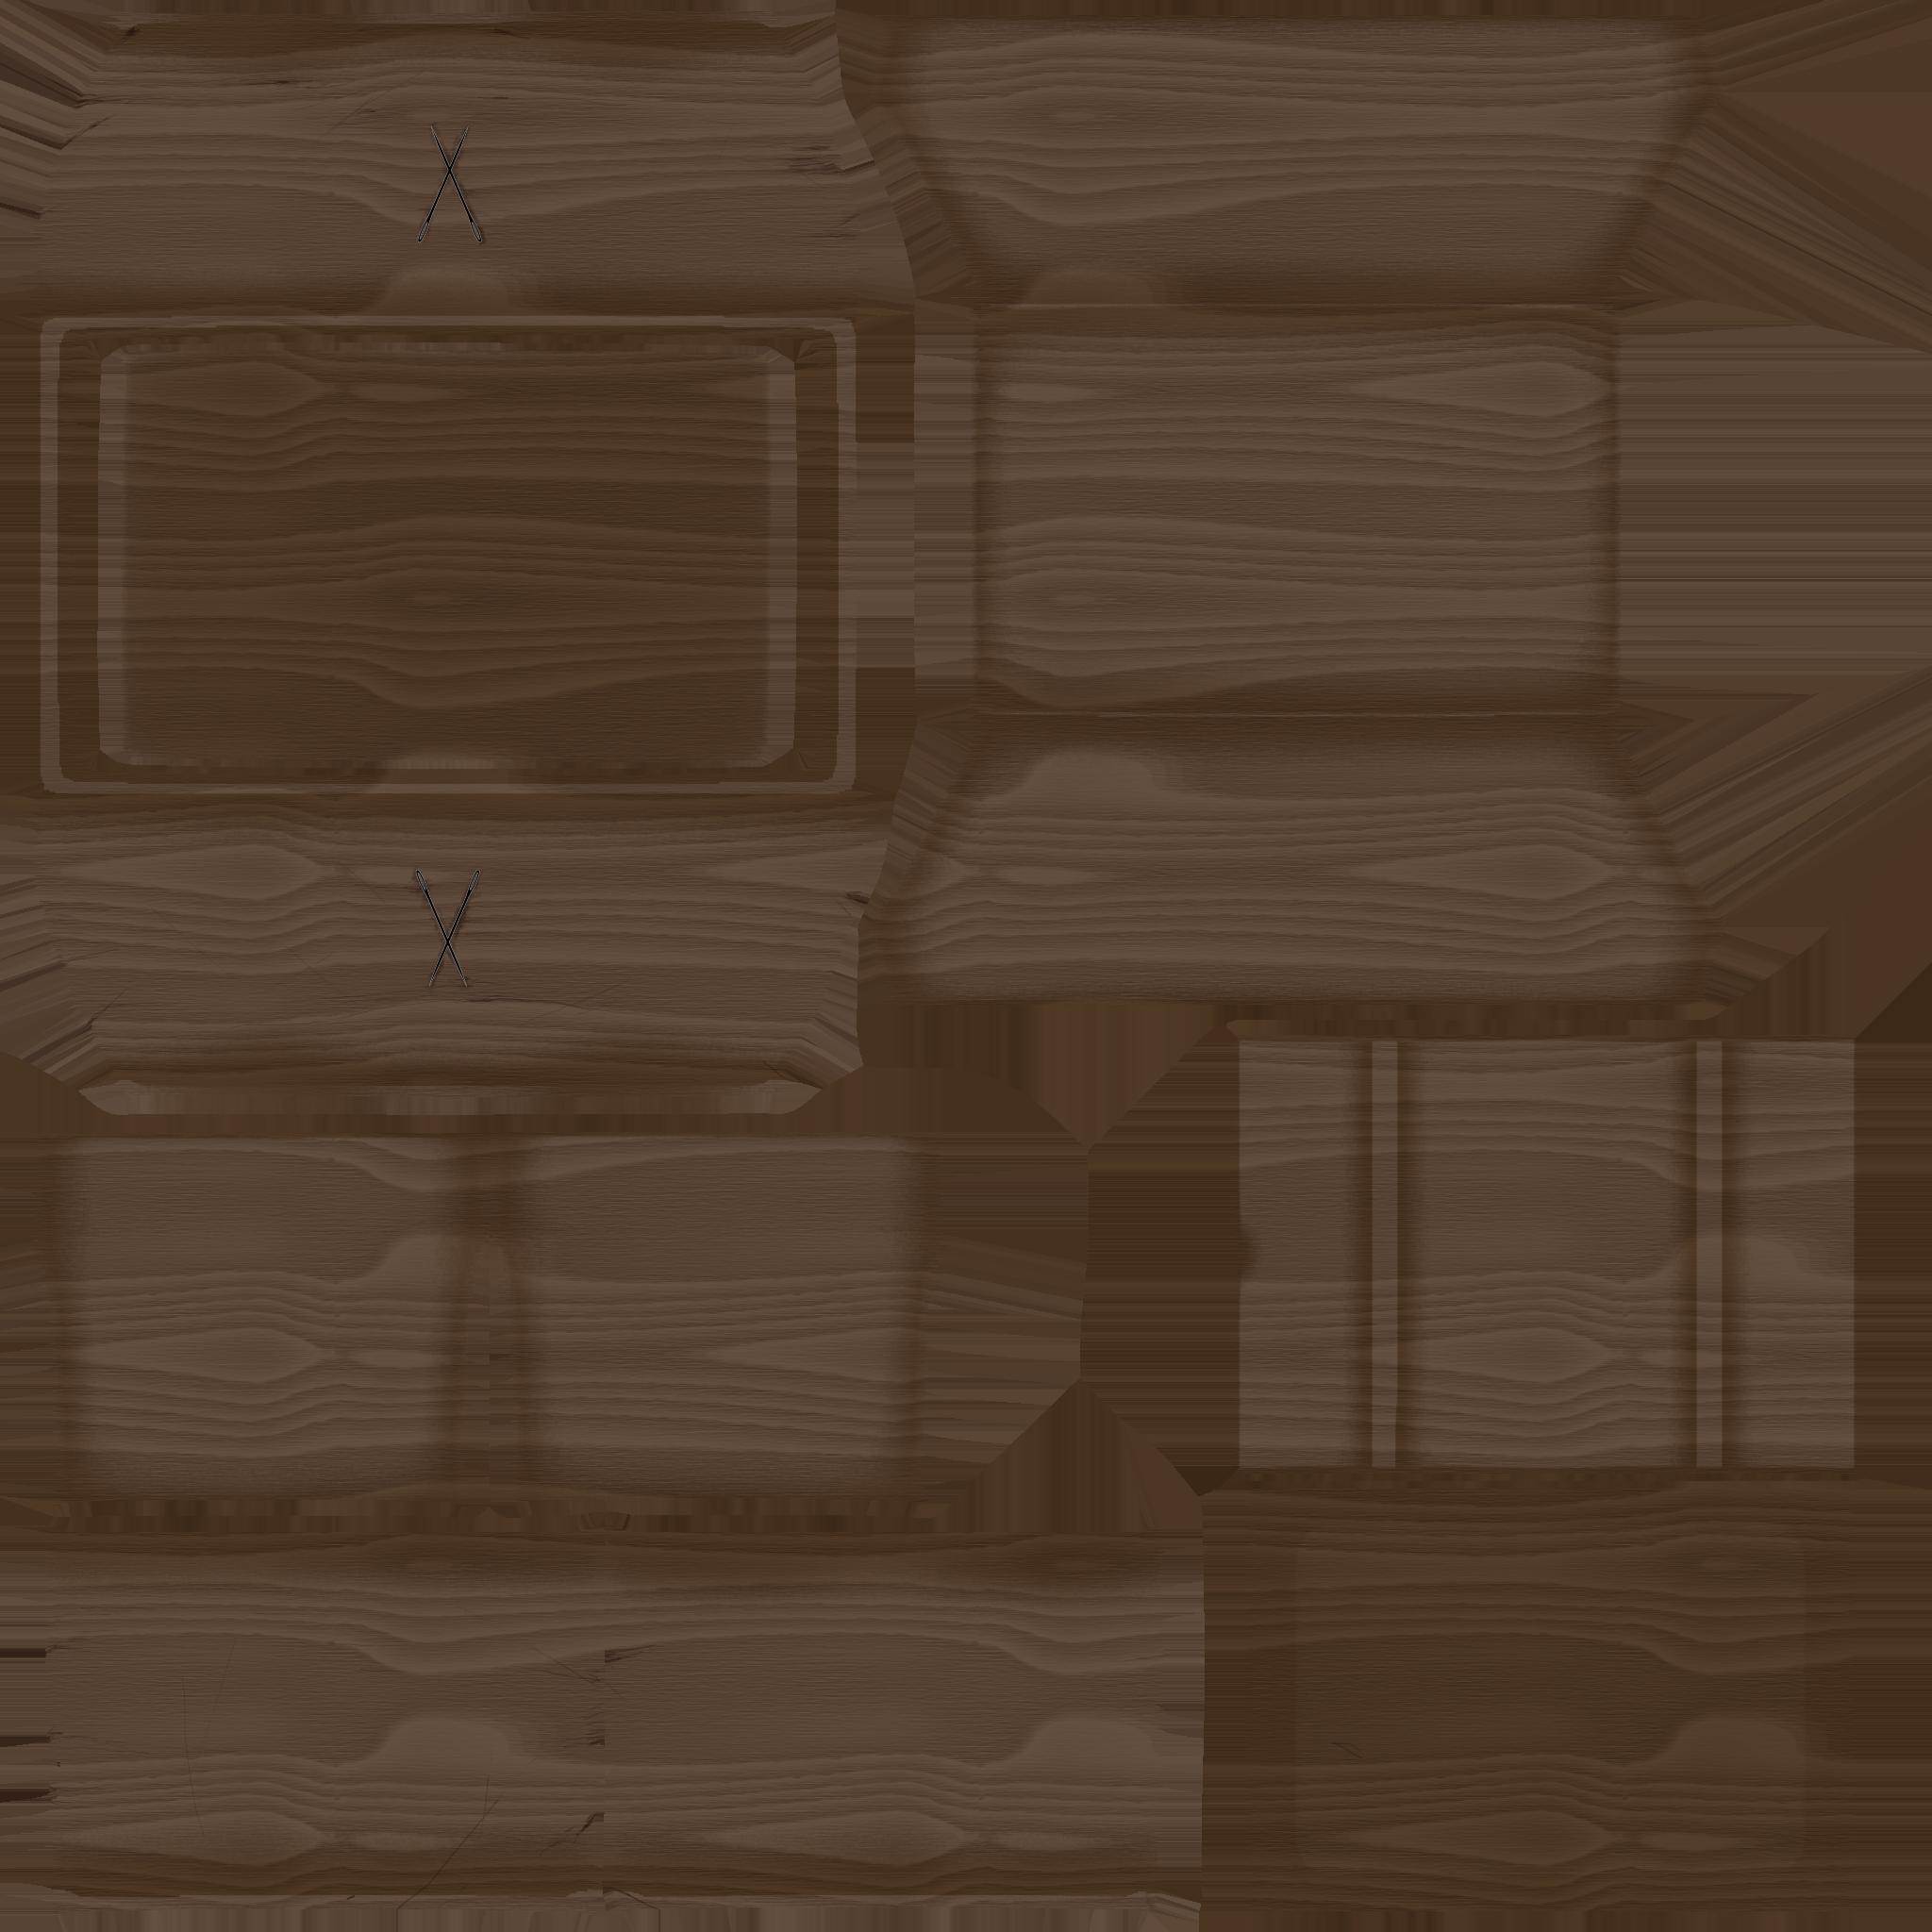 cart_uvSet_wood_Diffuse.png